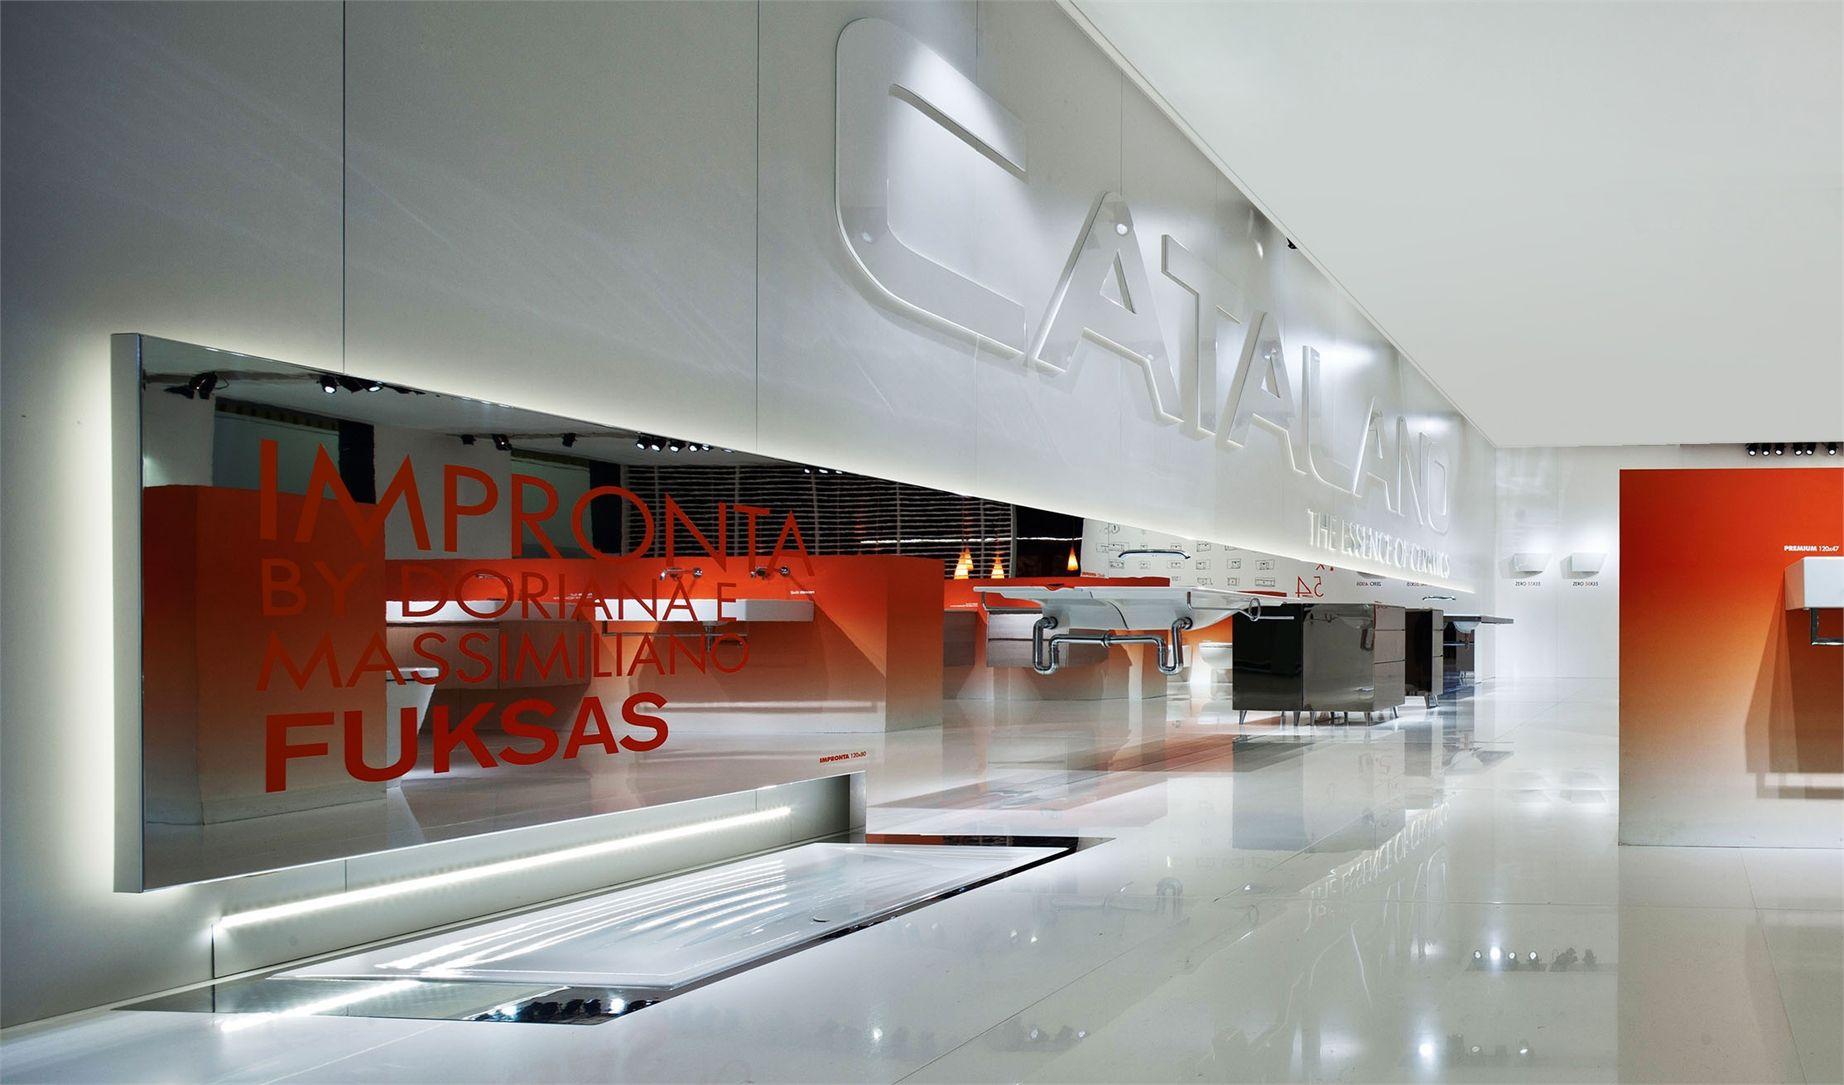 Stand catalano bank office interiors ceiling lights for Effebi arredamenti